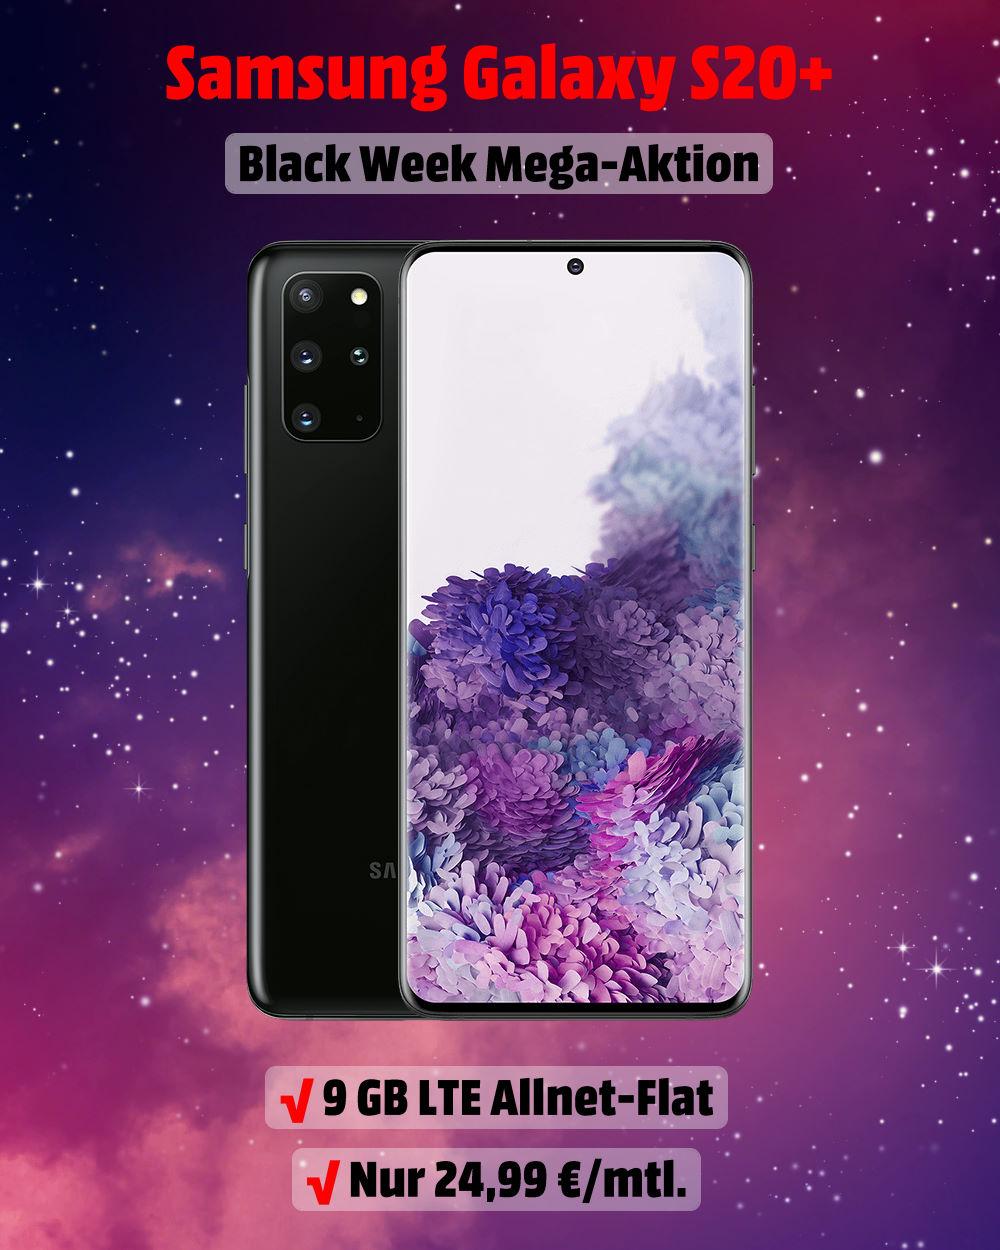 Samsung Galaxy S20 Plus mit 9 GB LTE Allnet-Flat Handyvertrag - Black Week Aktion